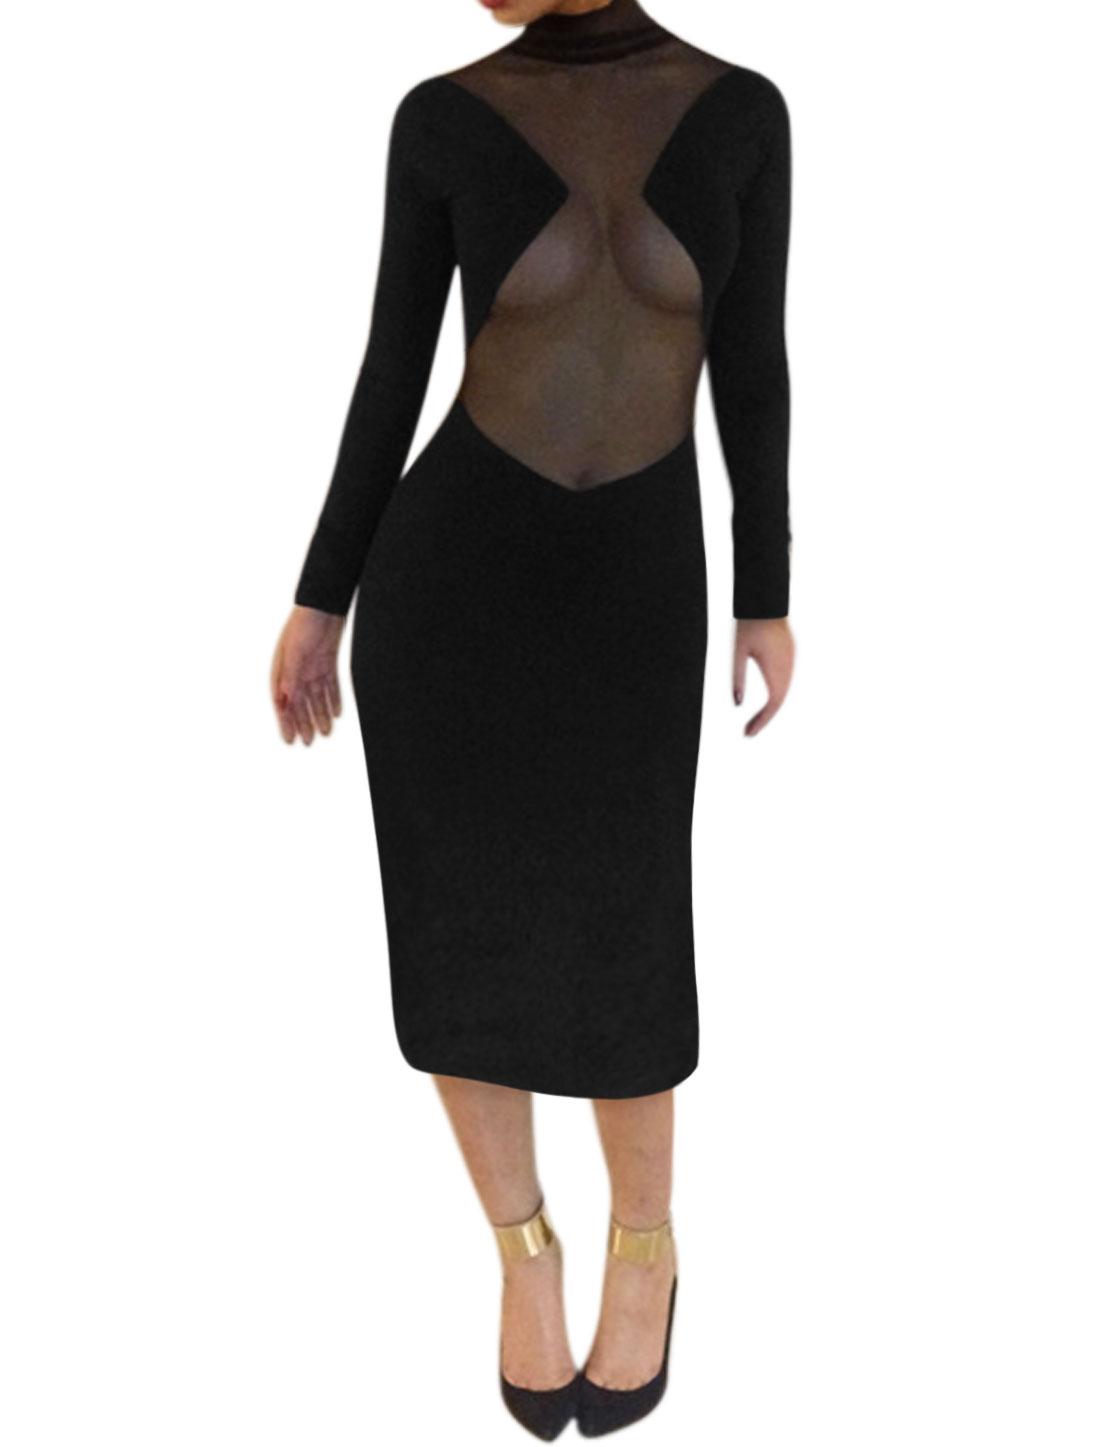 Women Mock Neck Mesh Panel Long Sleeve Semi Sheer Midi Dress Black L